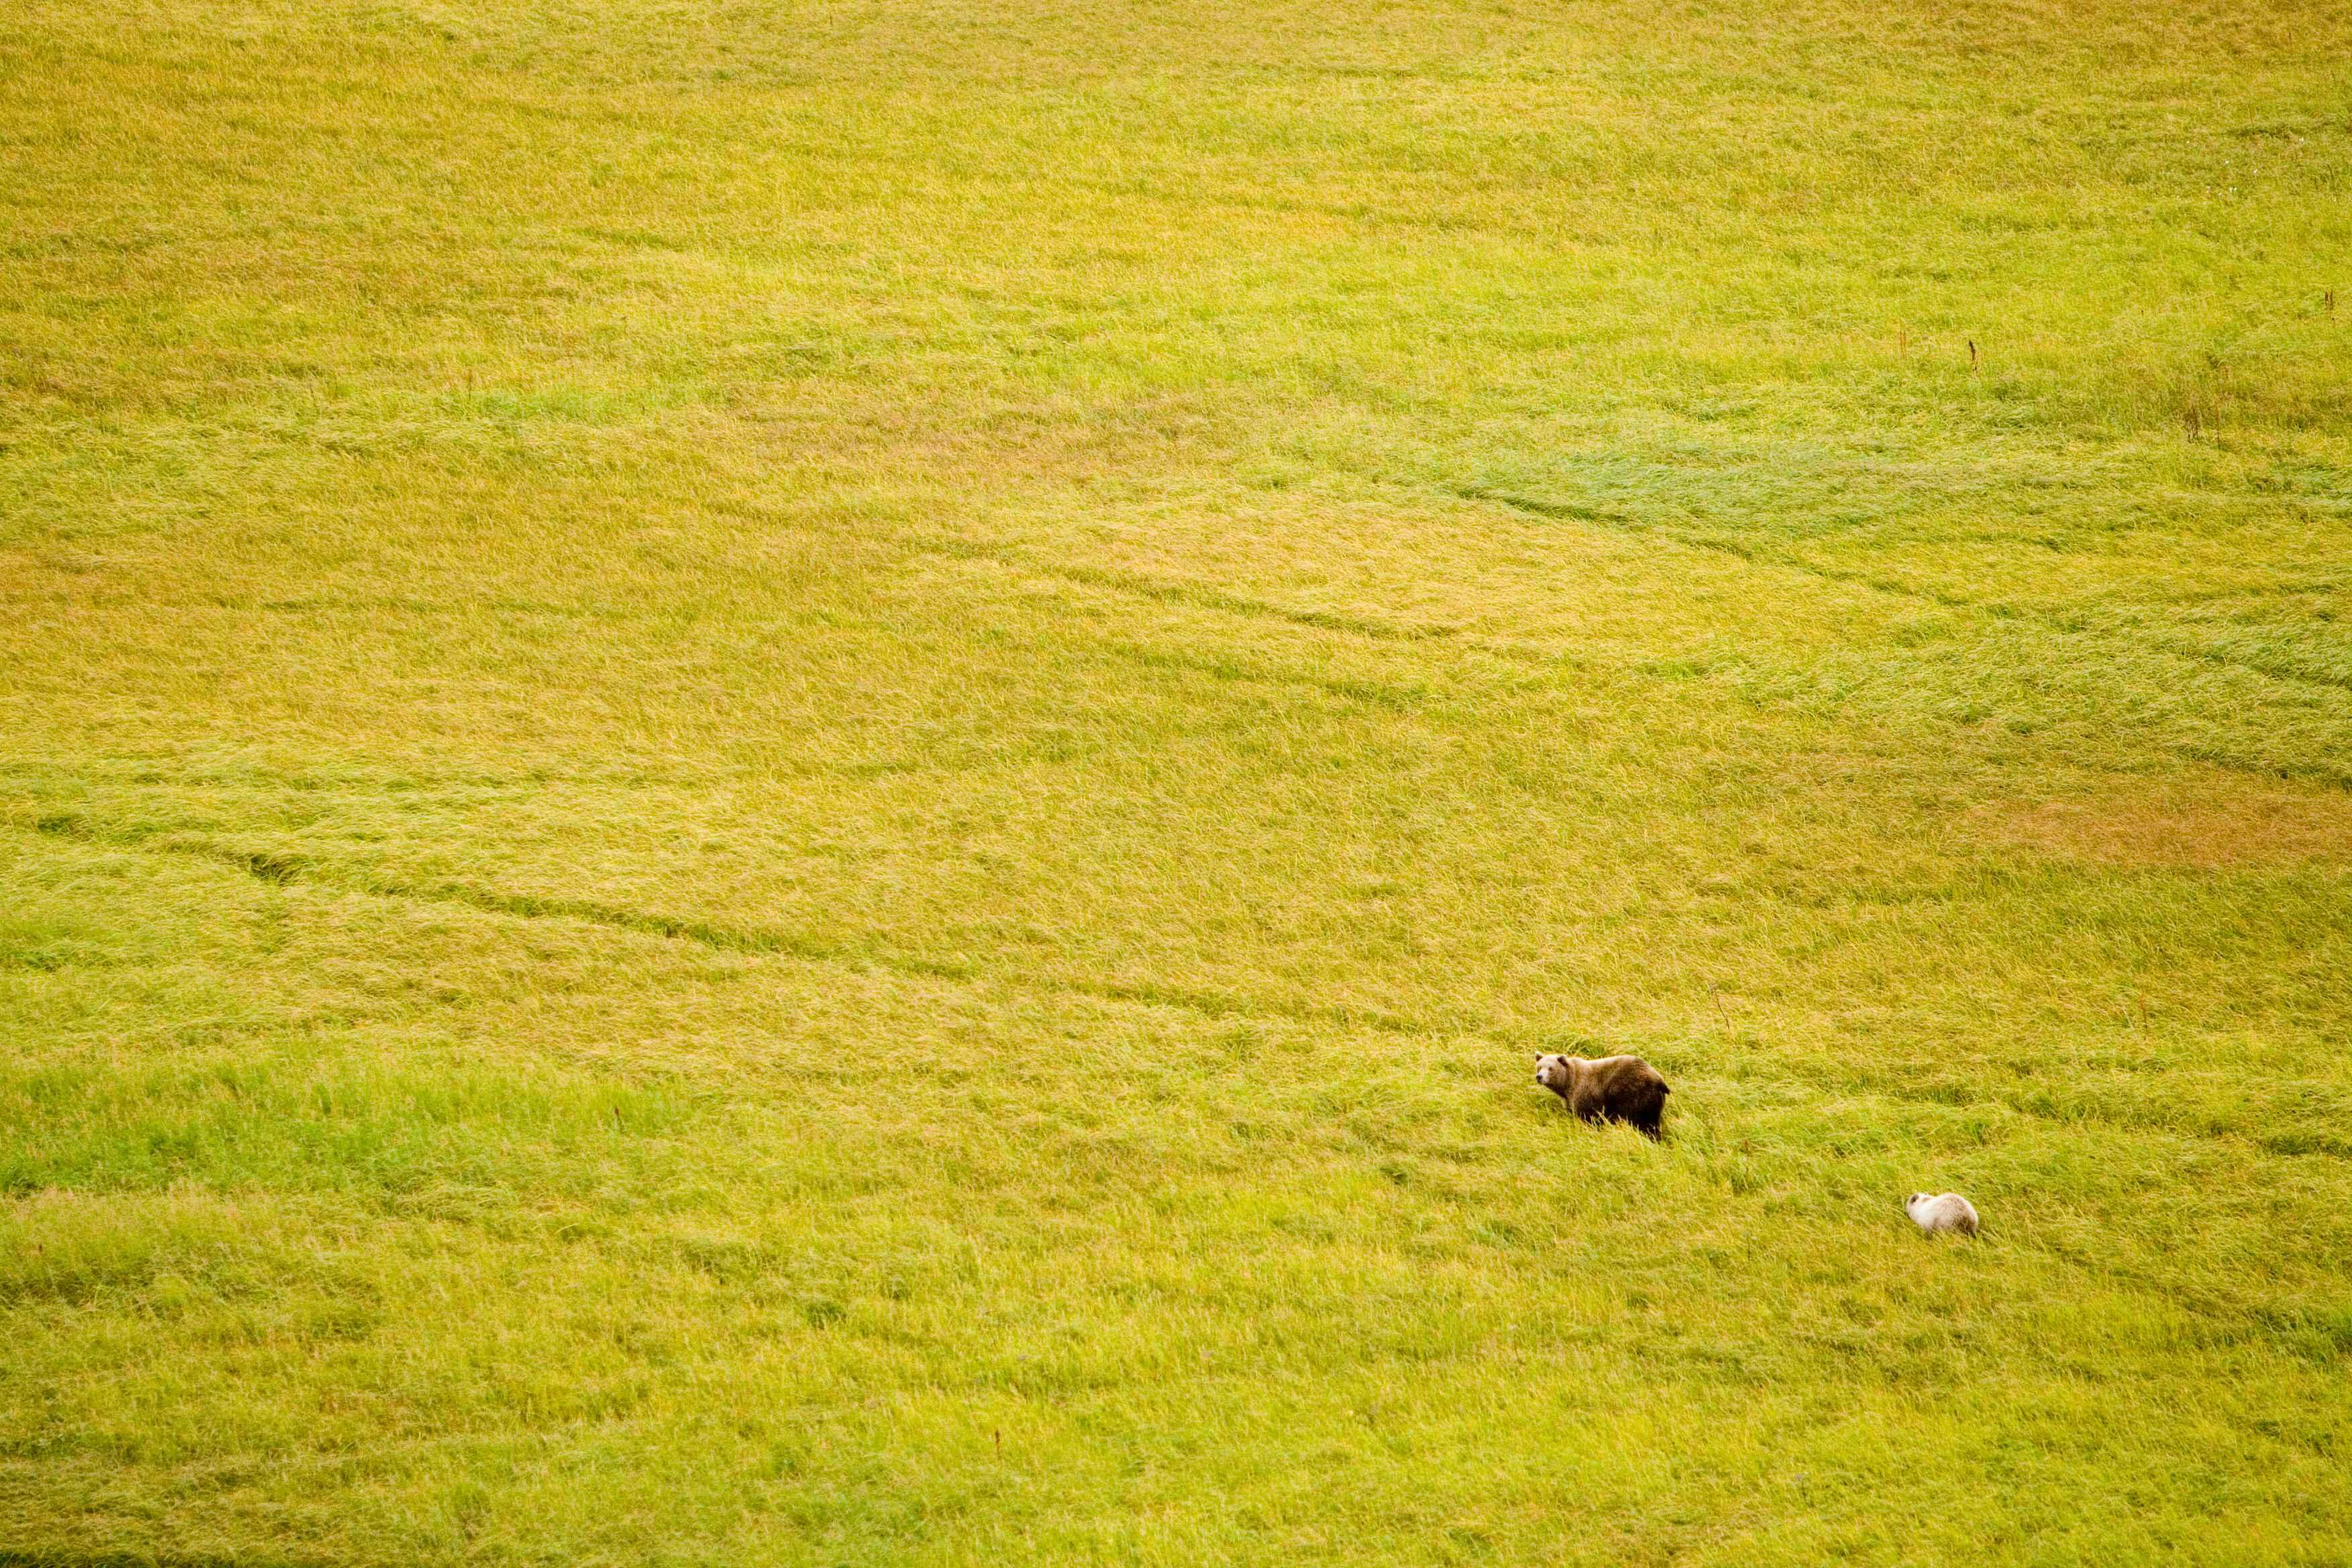 grass field aerial meadow aerial female brown bear cub venturing green field free picture